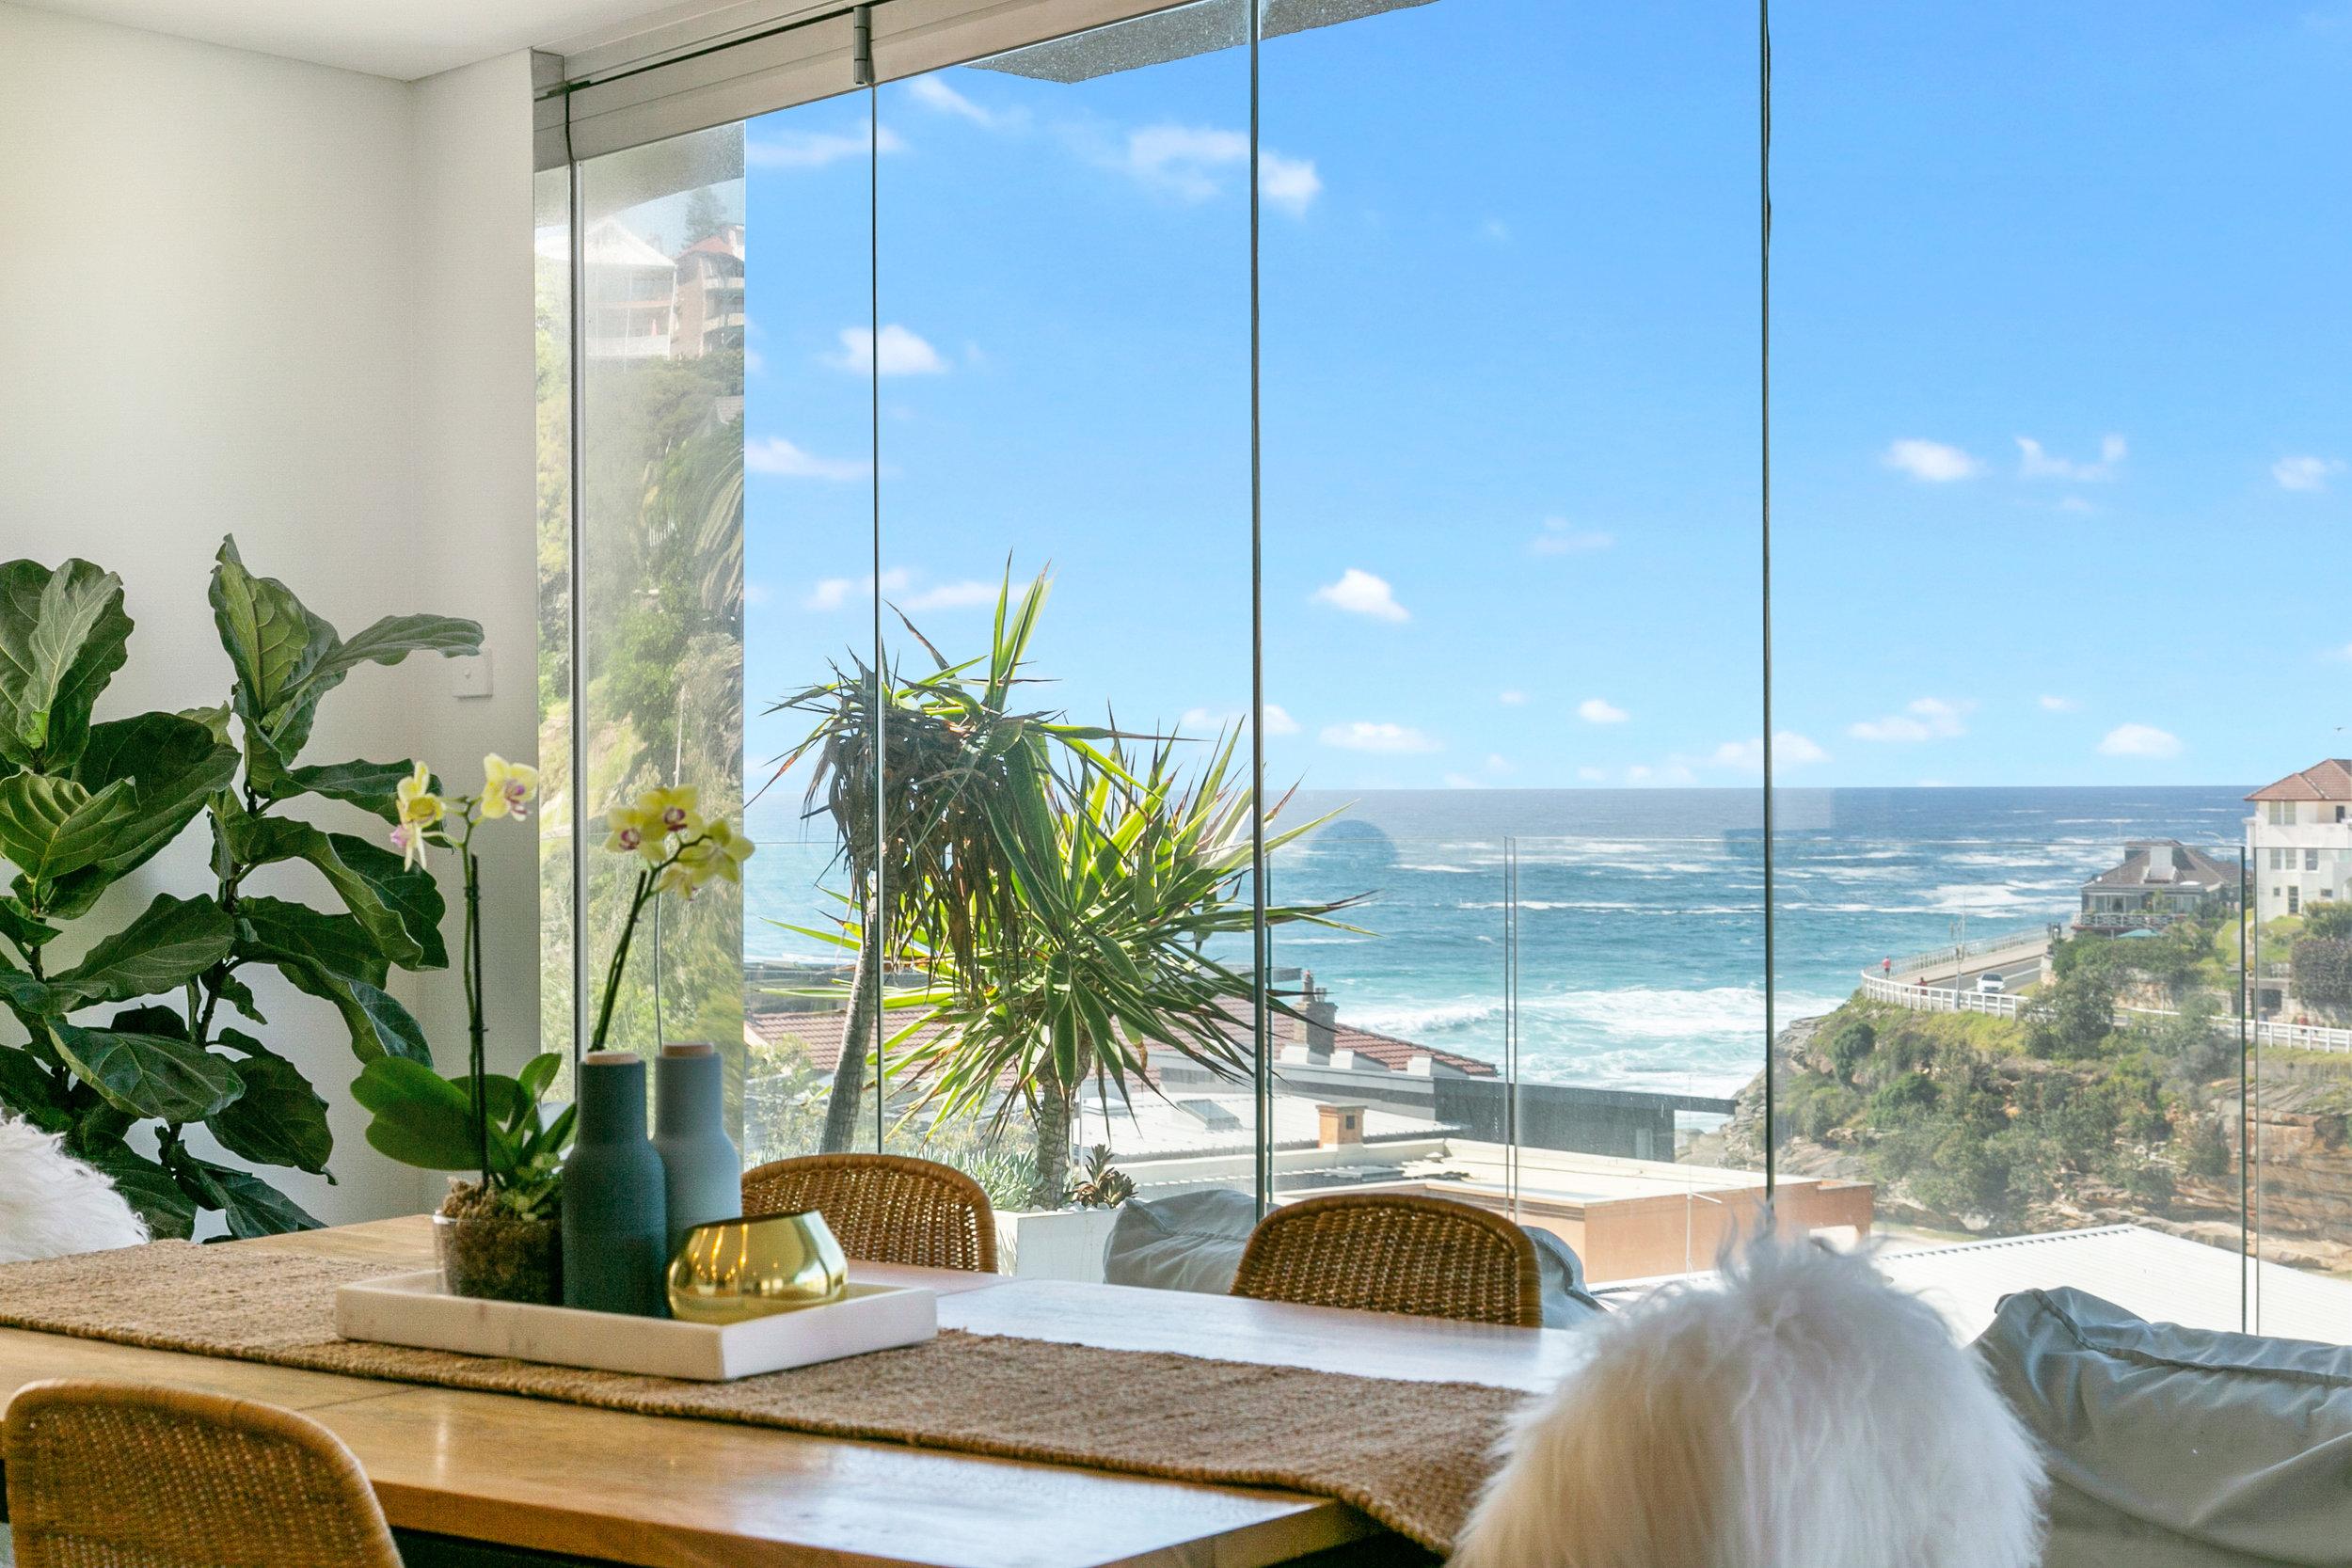 The Penthouse Tamarama ocean view. Bondi Beach Holiday Homes3.jpg